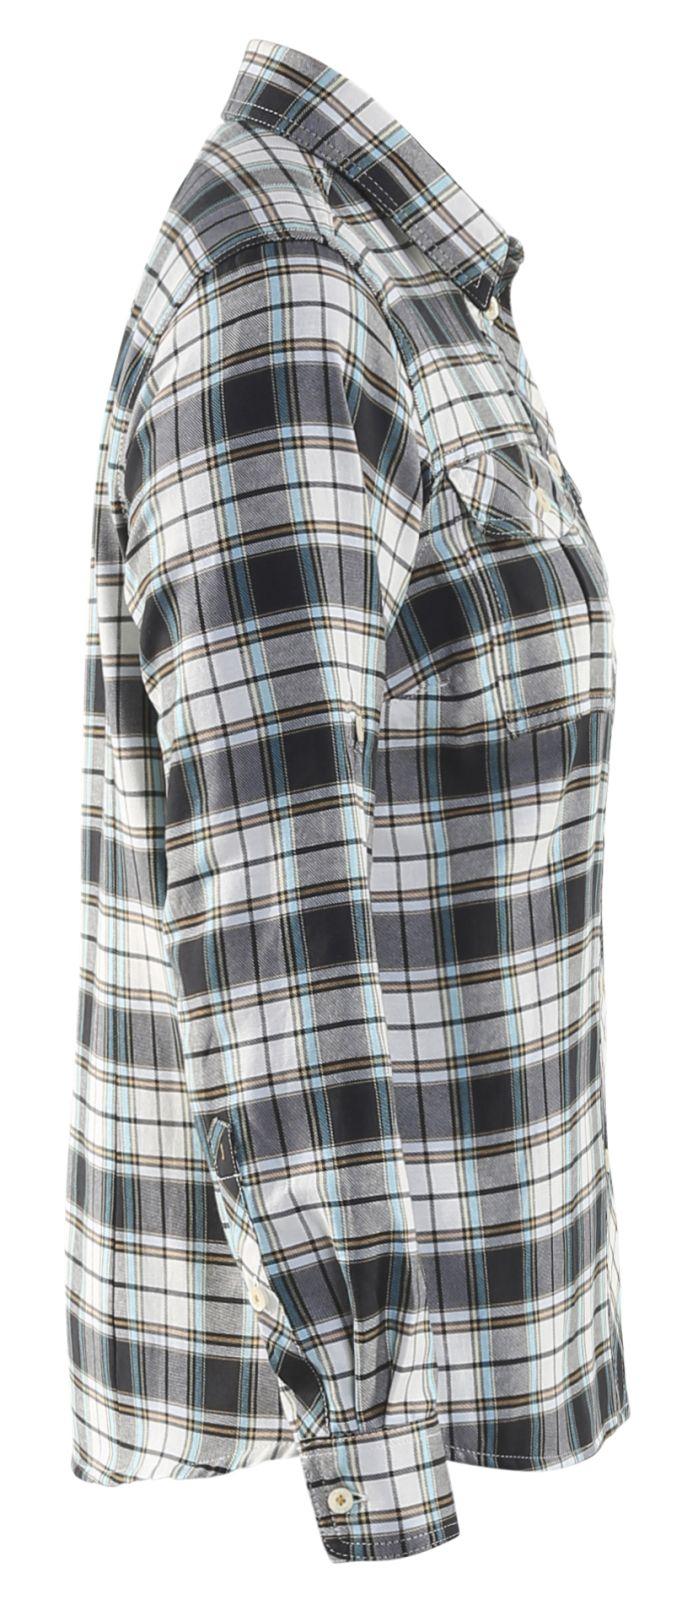 Blaklader Dames overhemden 32091136 zwart-offwhite(9920)